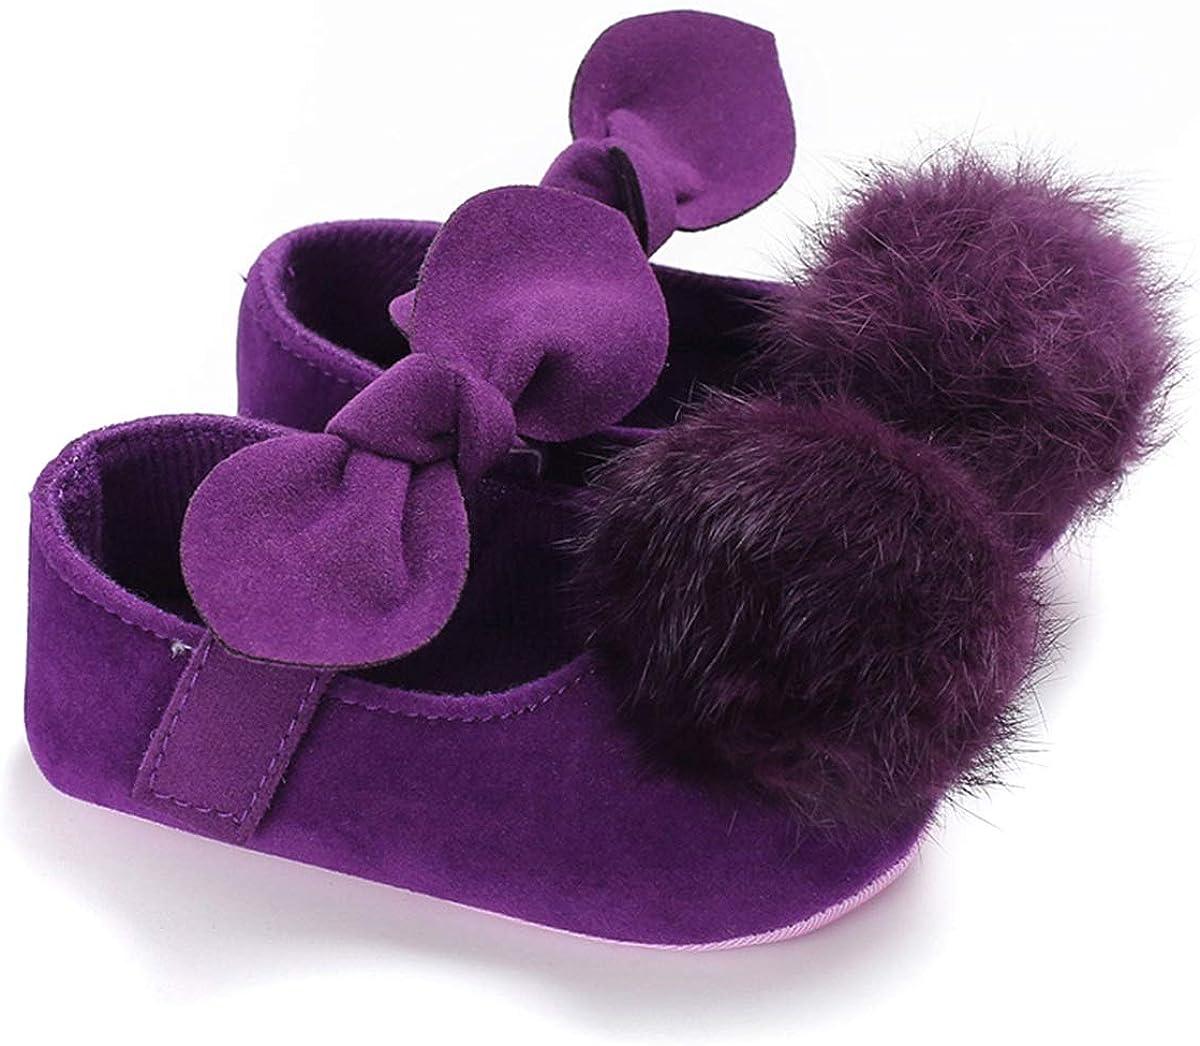 Newborn Baby Girl Fuzzy Ball Prewalker First Walking Shoes Soft Sole Flat Shoes